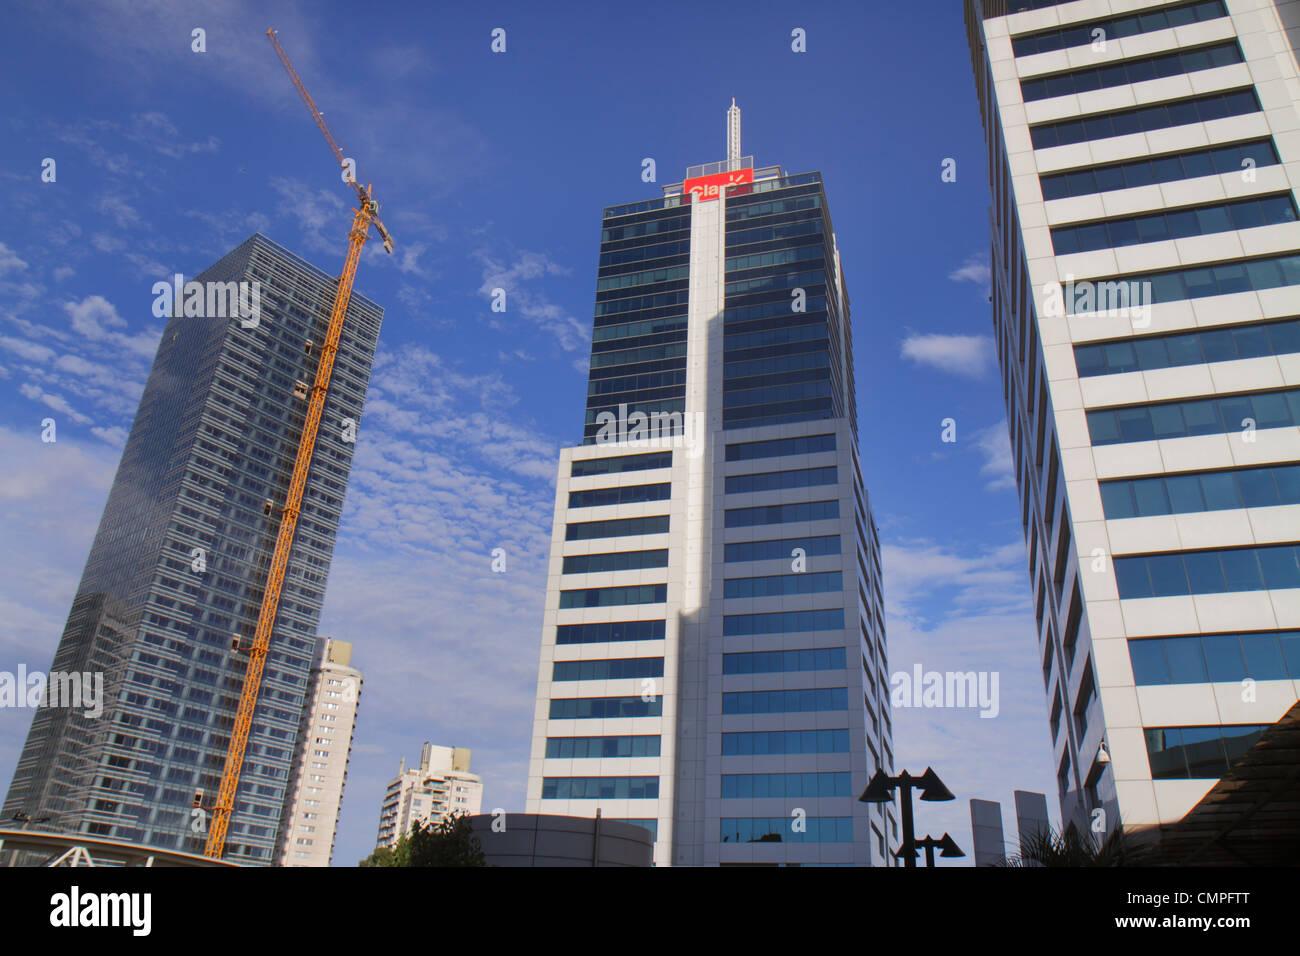 Uruguay Montevideo Avenida Dr. Luis Alberto de Herrera Montevideo World Trade Center centre construction economic - Stock Image